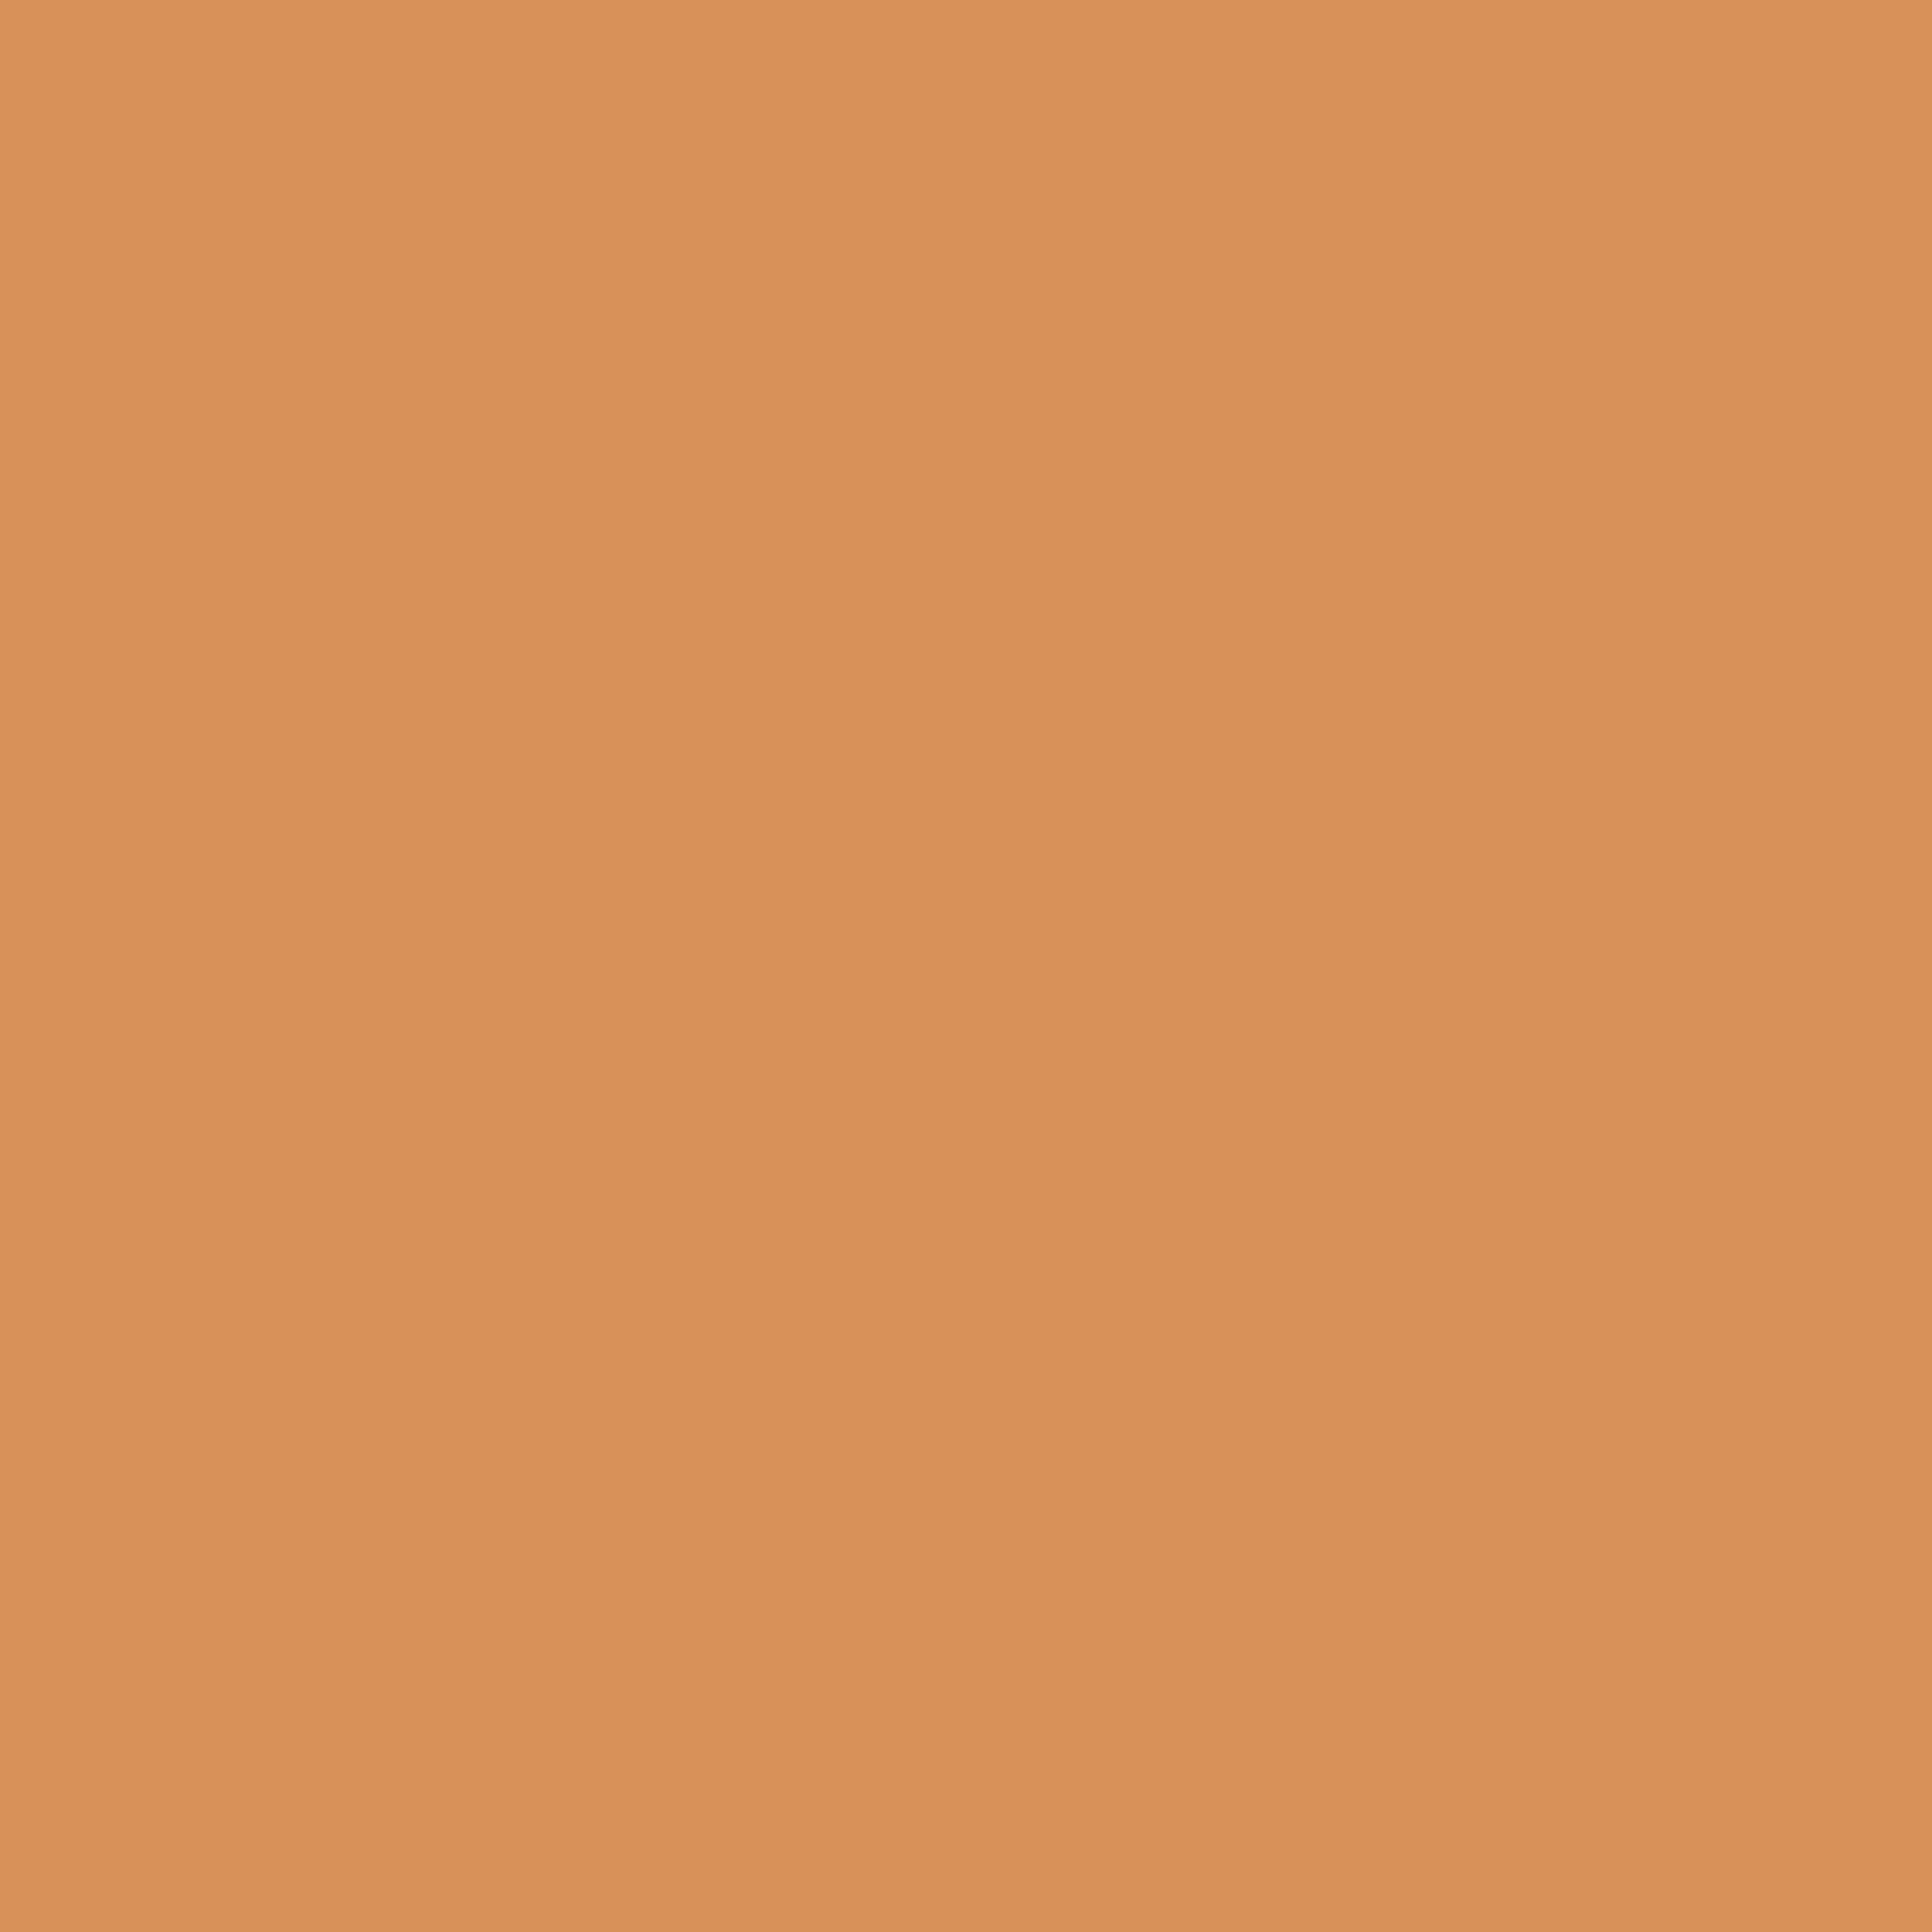 2732x2732 Persian Orange Solid Color Background